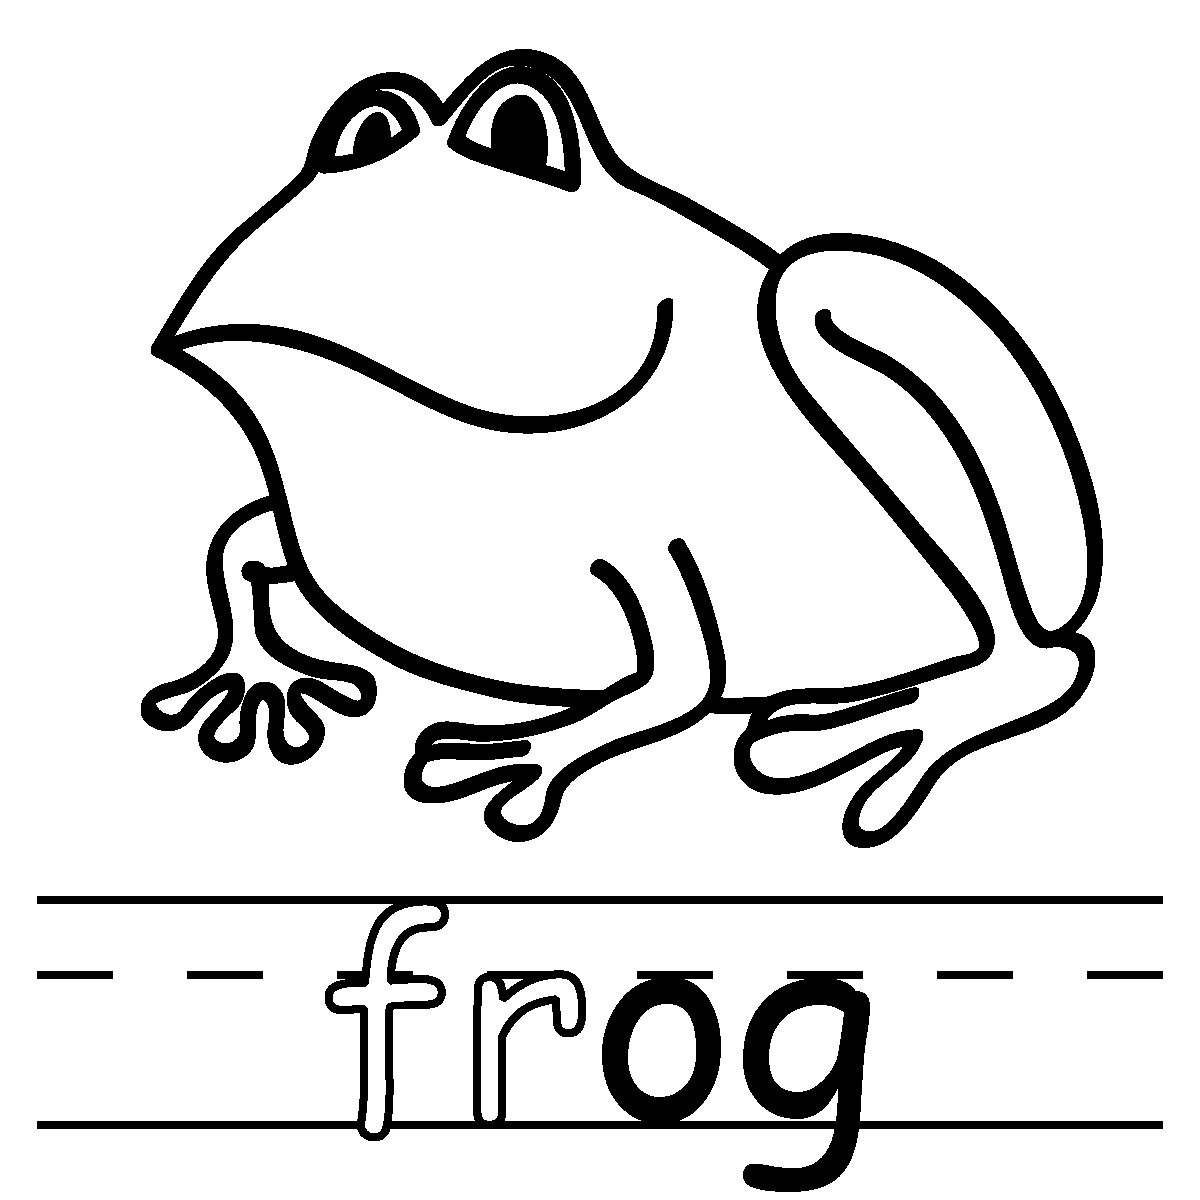 1200x1200 Amphibian Clipart Coloring Page